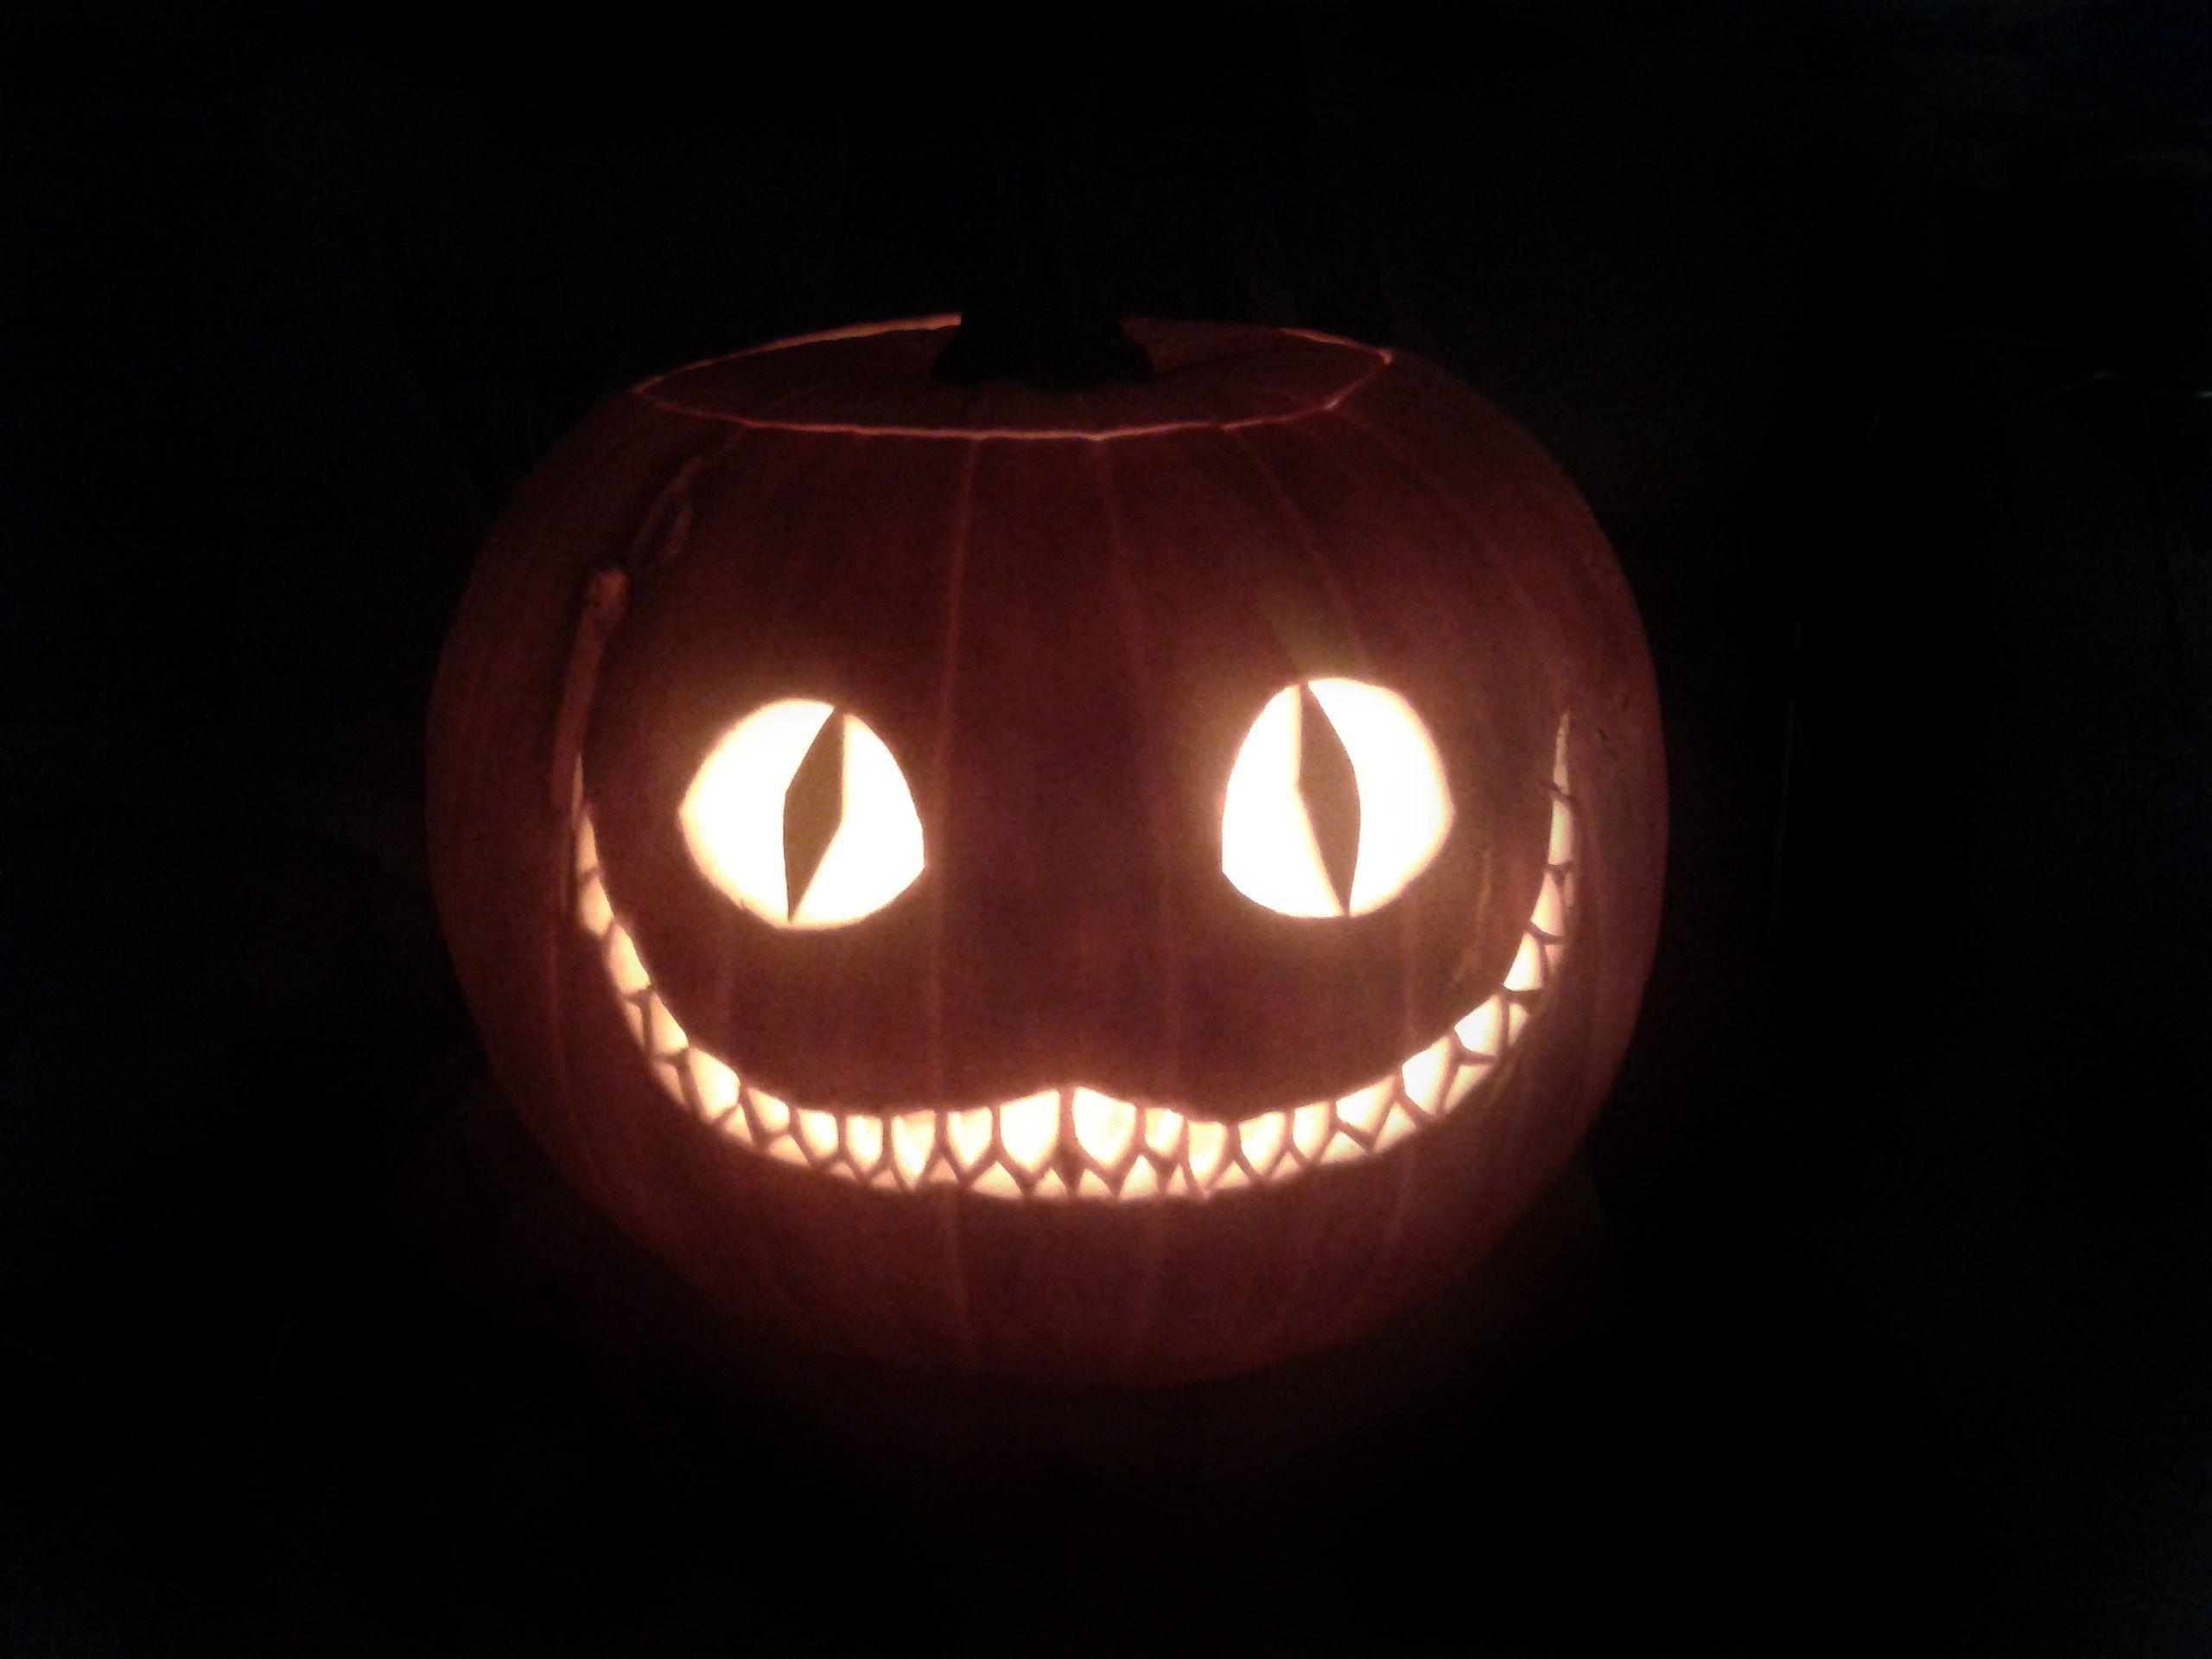 Cheshire Cat Pumpkin Stencil Pattern Year Of Clean Water